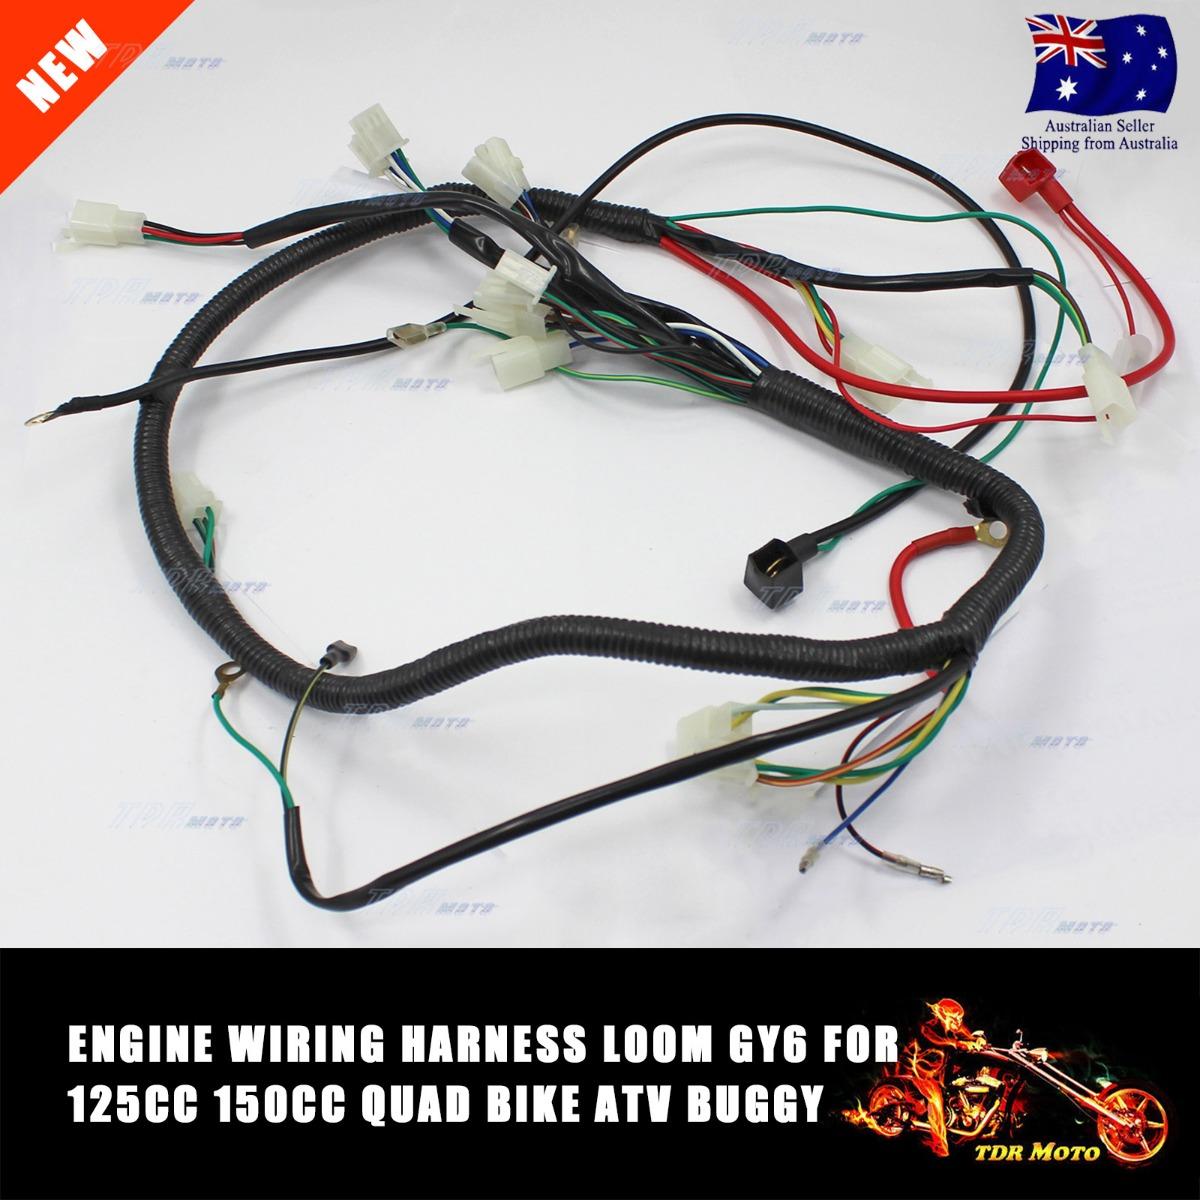 Boxer Go Kart Wiring Harness Diagrams Electrical Diagram 250cc Dune Buggy Wire Loom 150cc 200cc 300cc Atv Quad Gy6